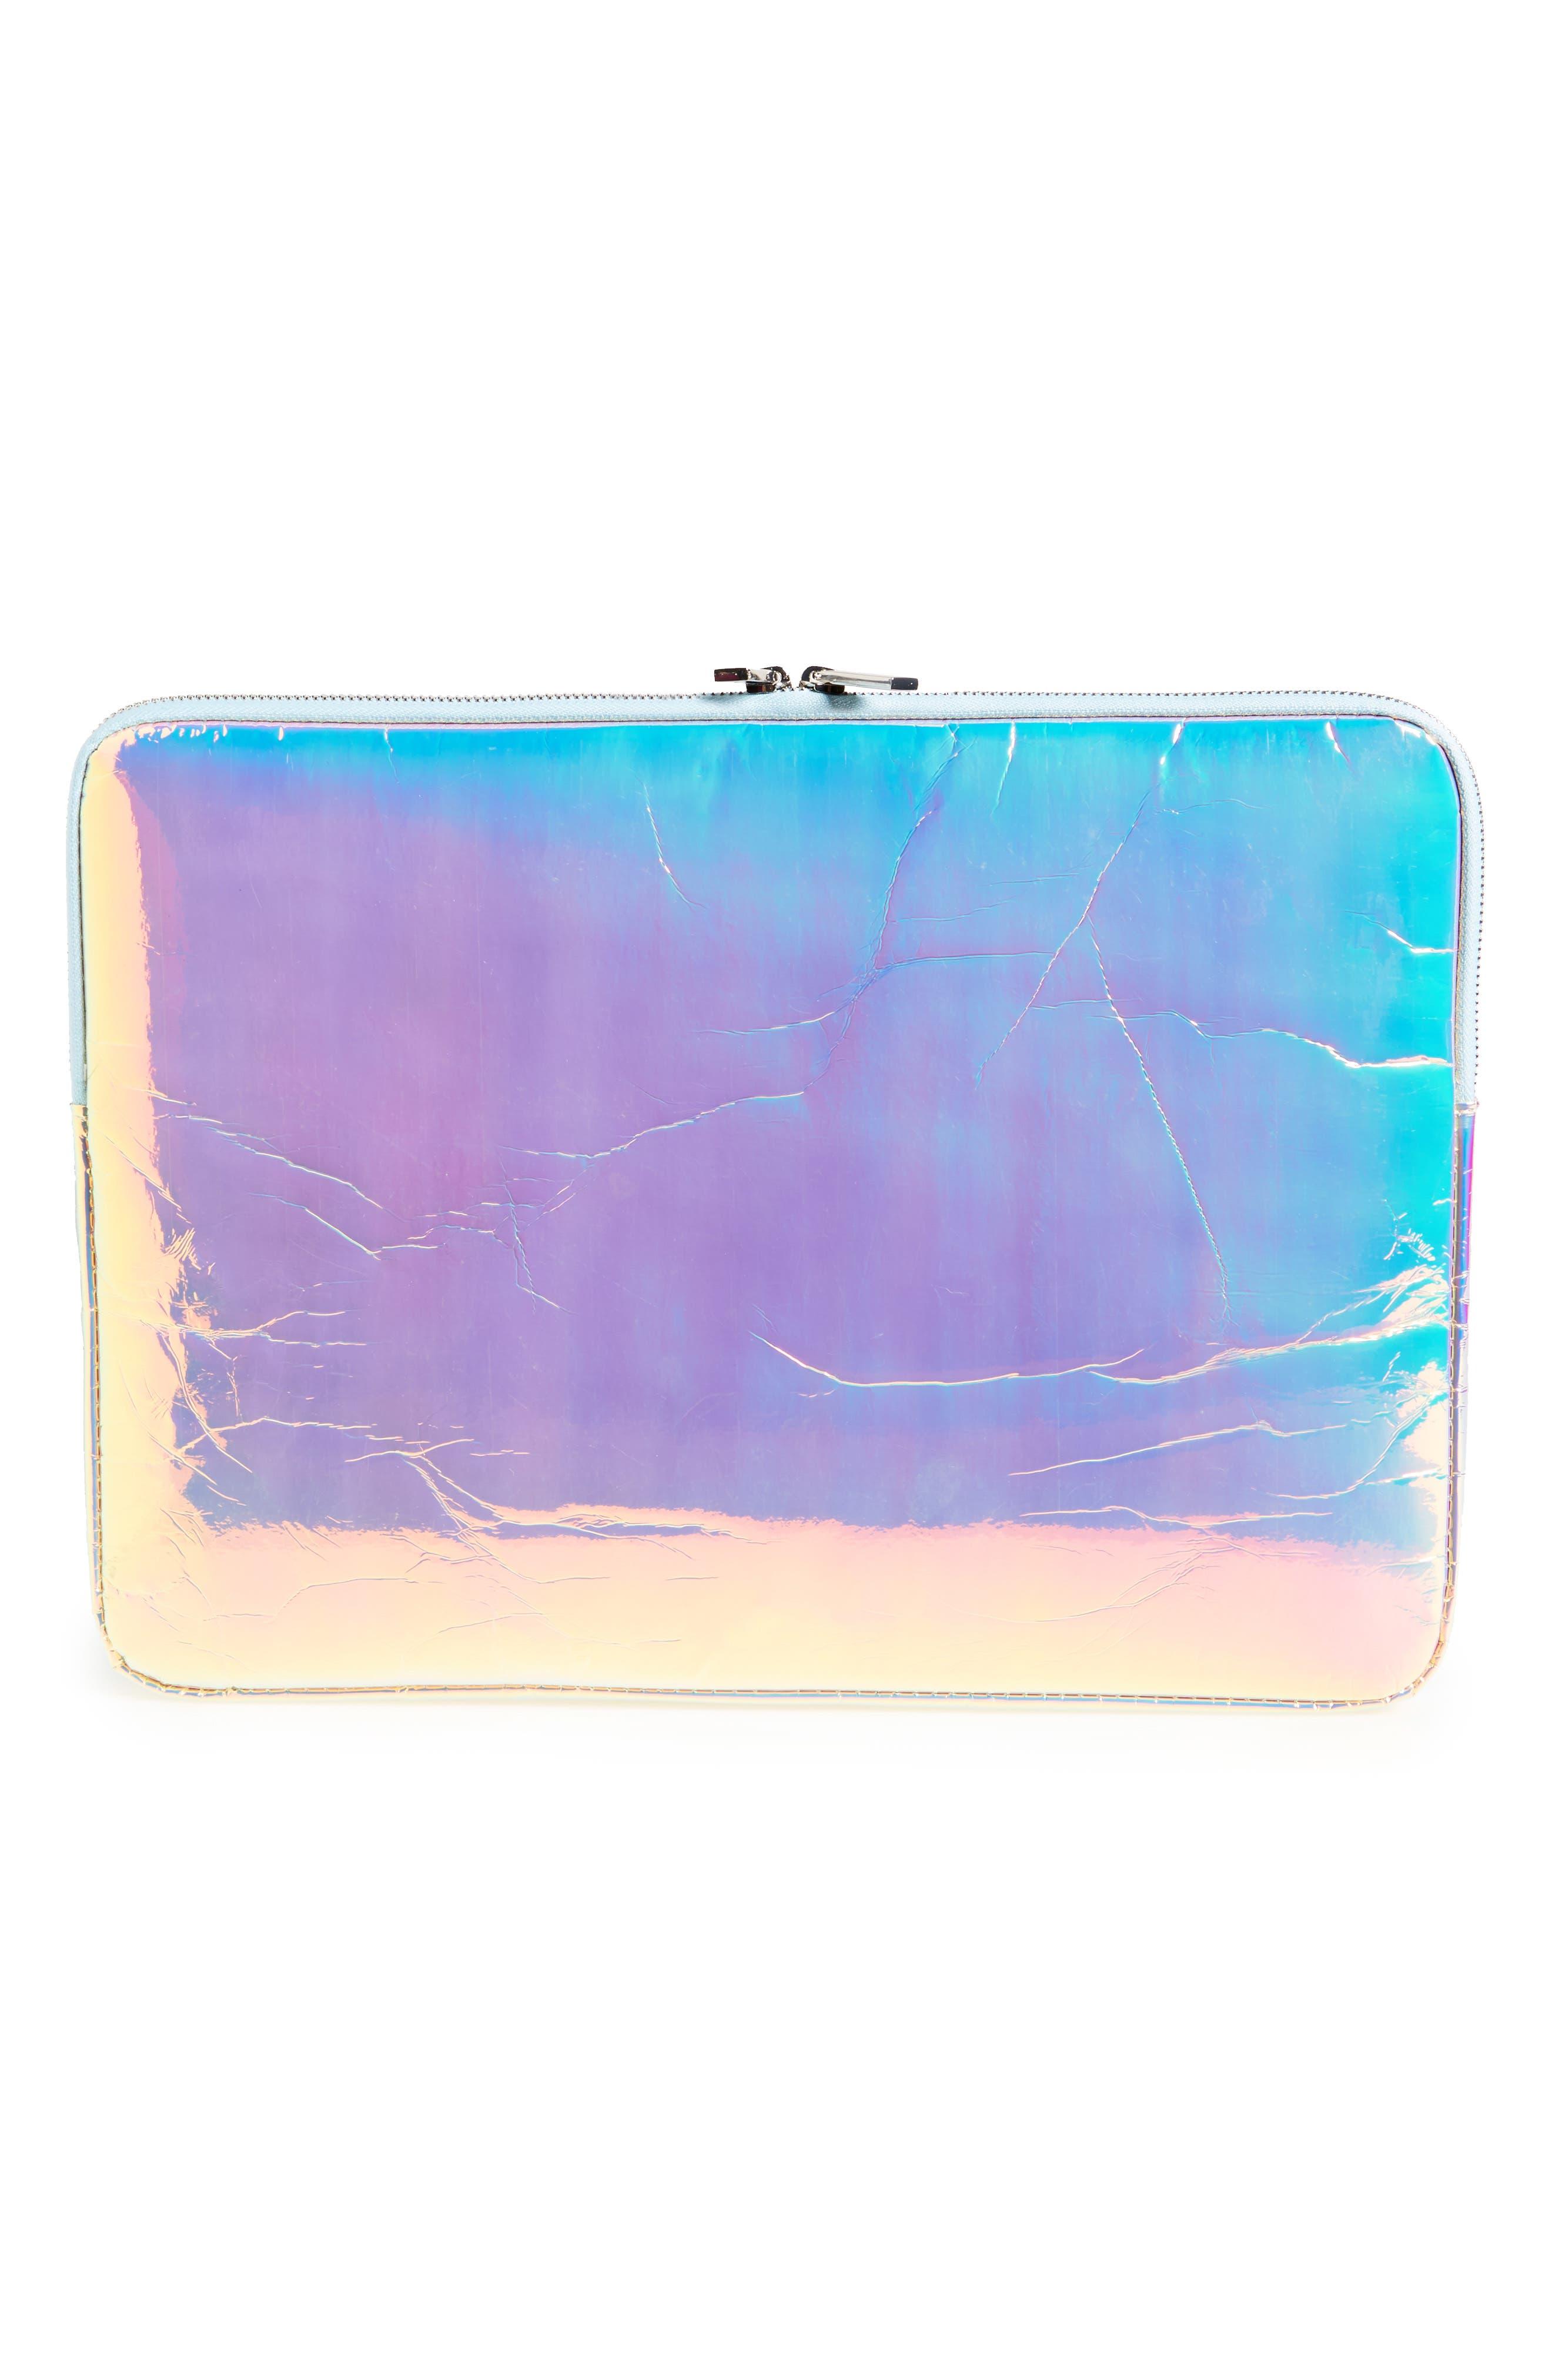 Main Image - Skinnydip Ocean 15-Inch Laptop Sleeve